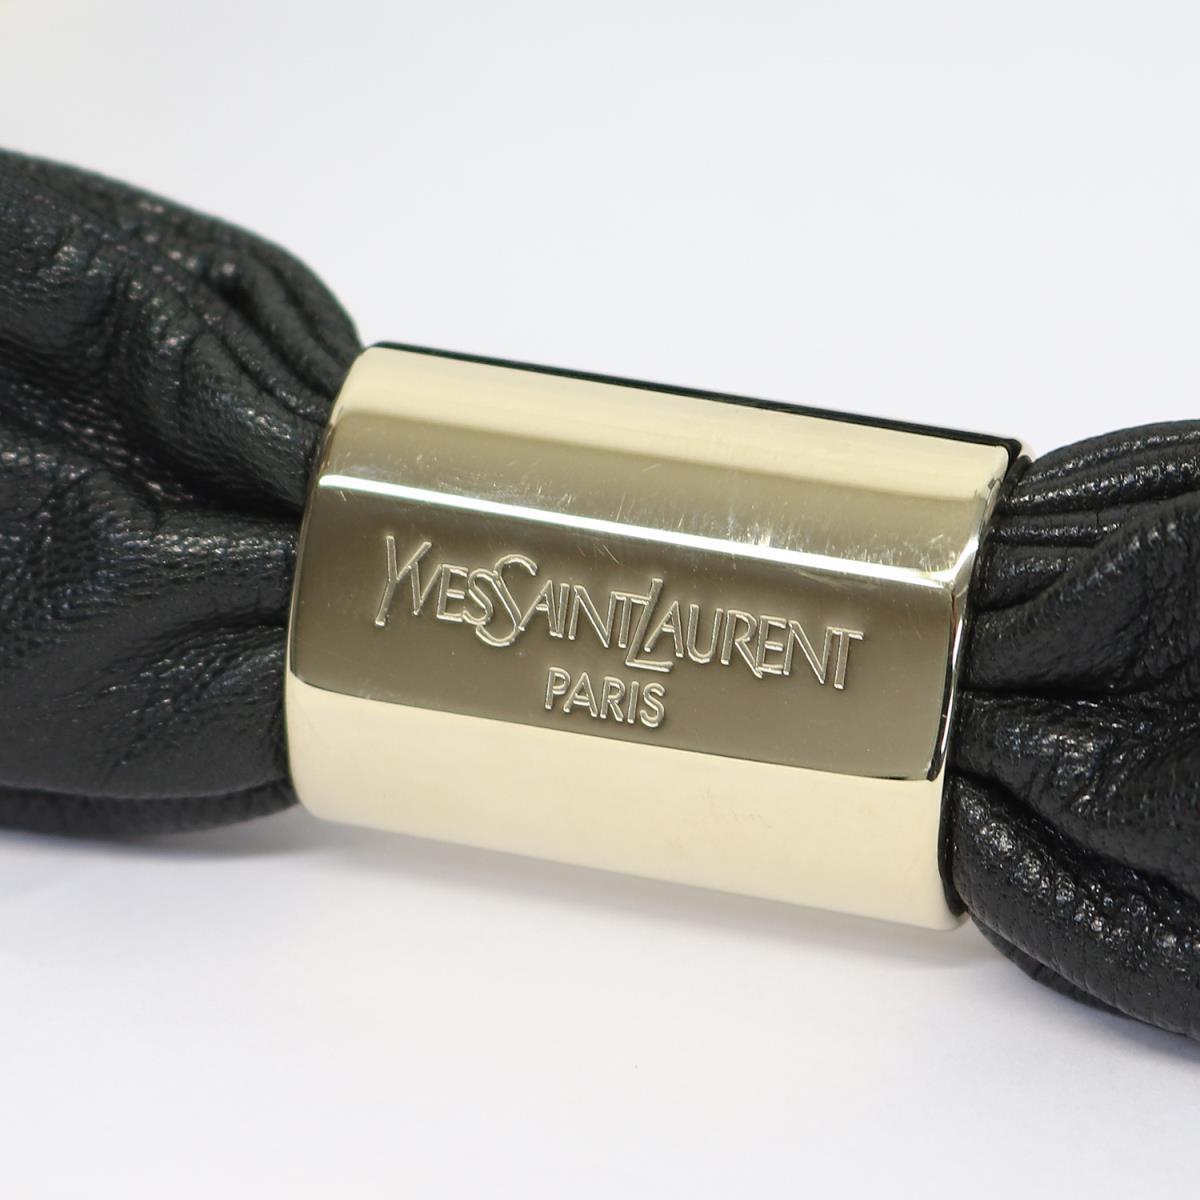 be6284c5fbb1 YVES SAINT LAURENT (Eve Saint-Laurent) frill leather suede cloth handbag  mini-tote bag black X brown X khaki